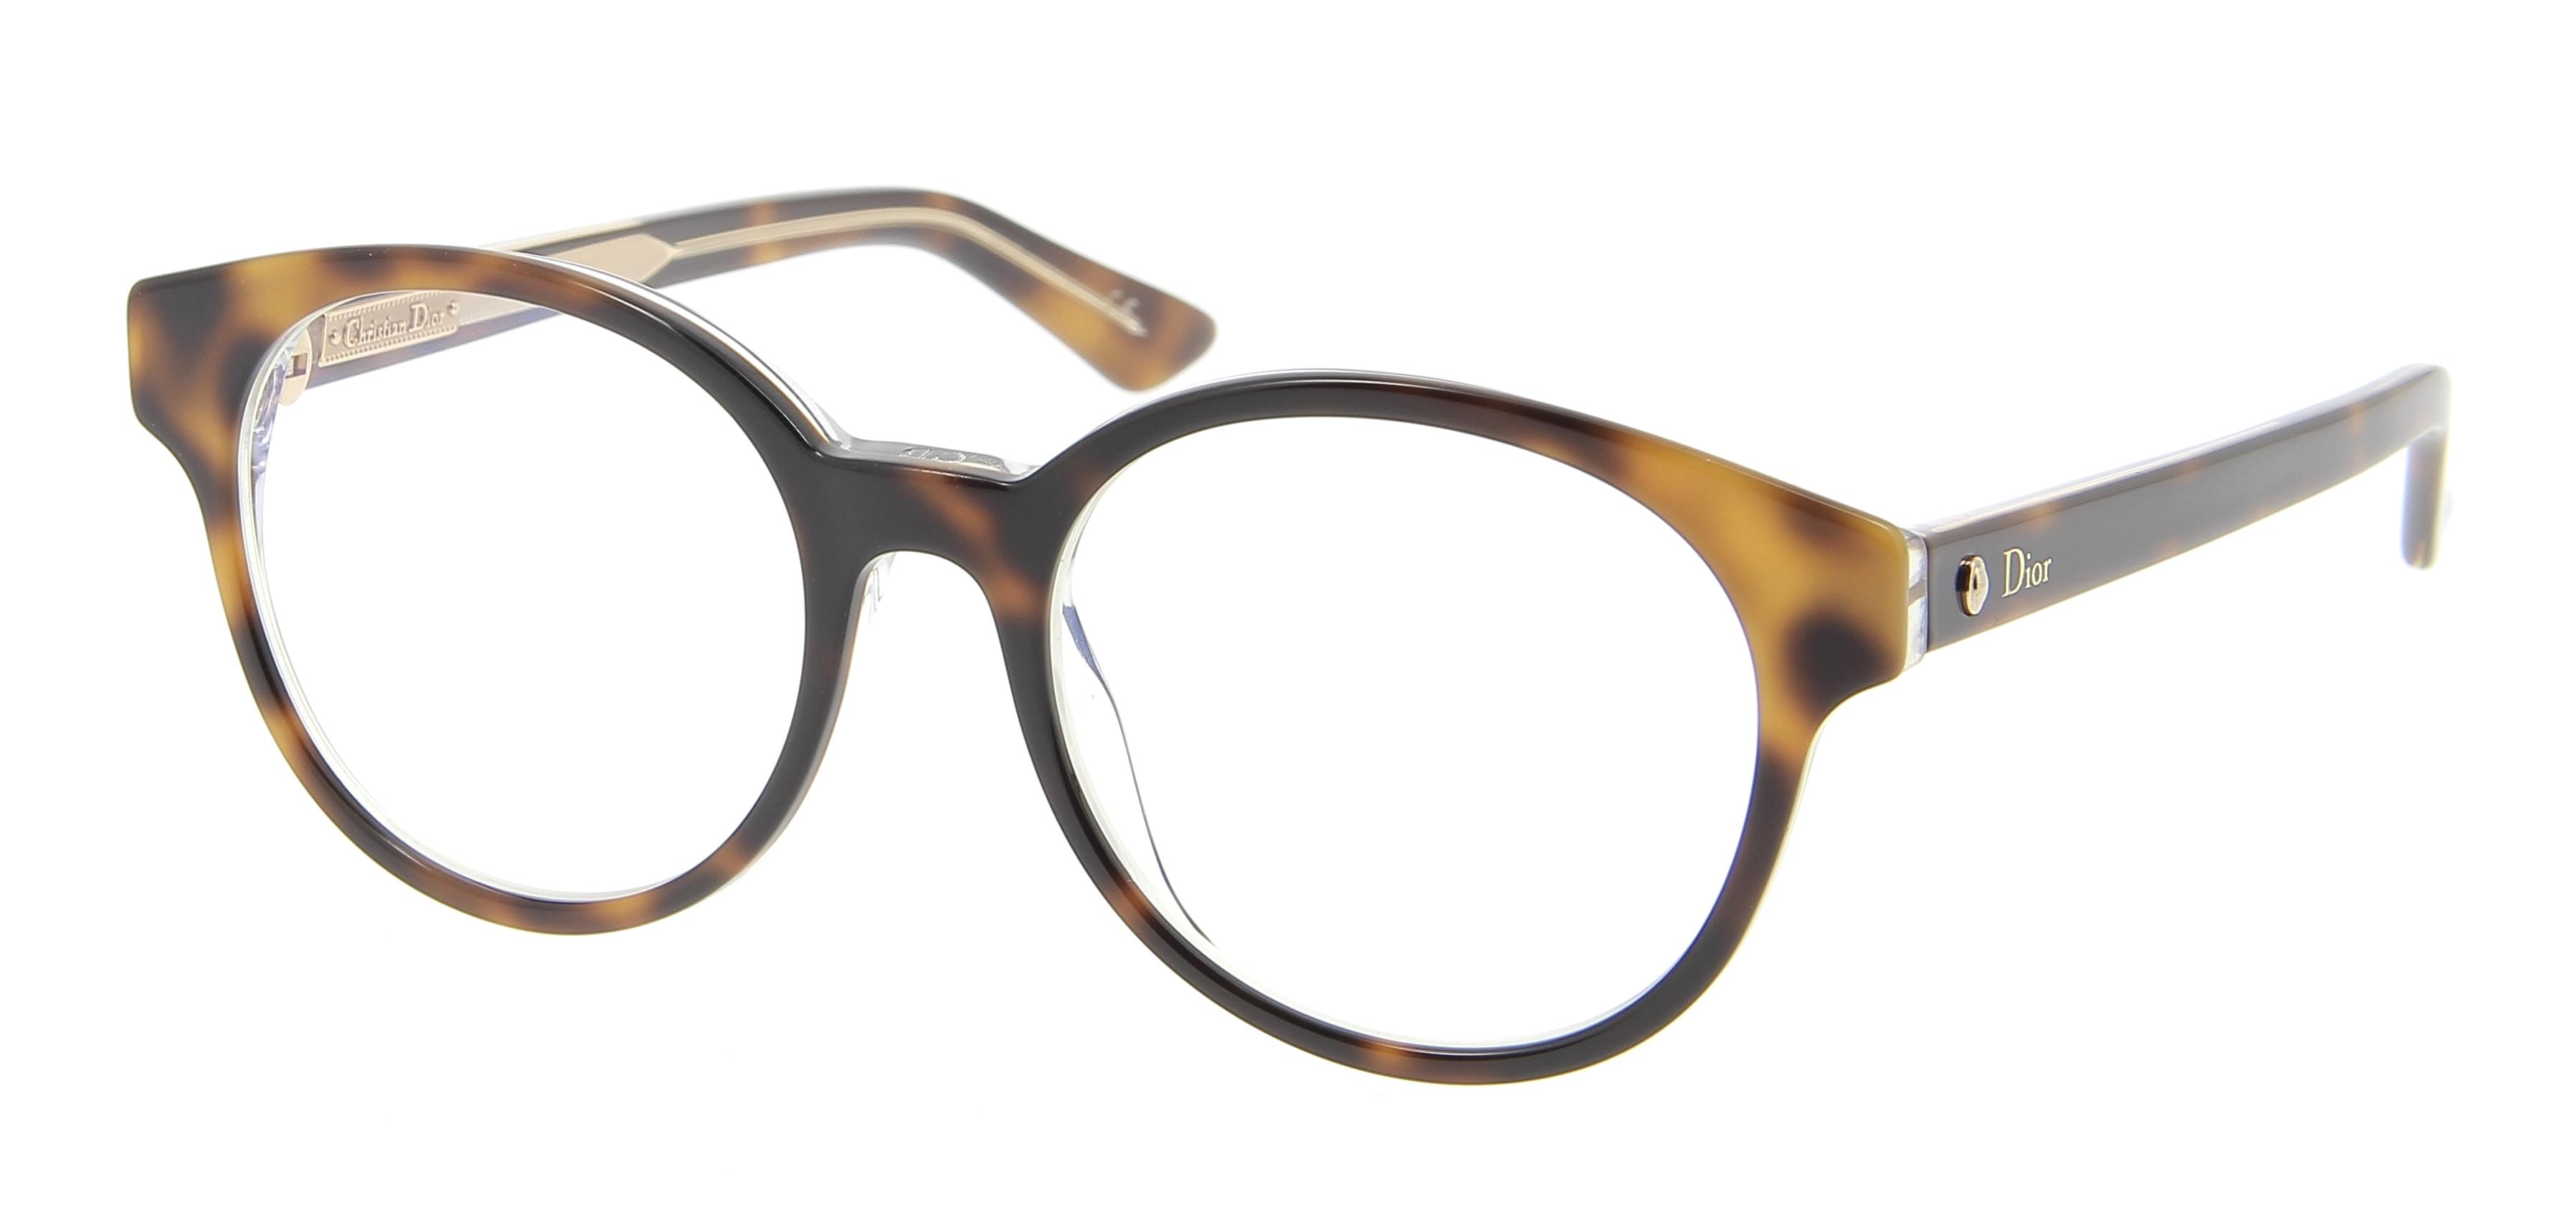 lunettes de vue dior femme 2012 louisiana bucket brigade. Black Bedroom Furniture Sets. Home Design Ideas